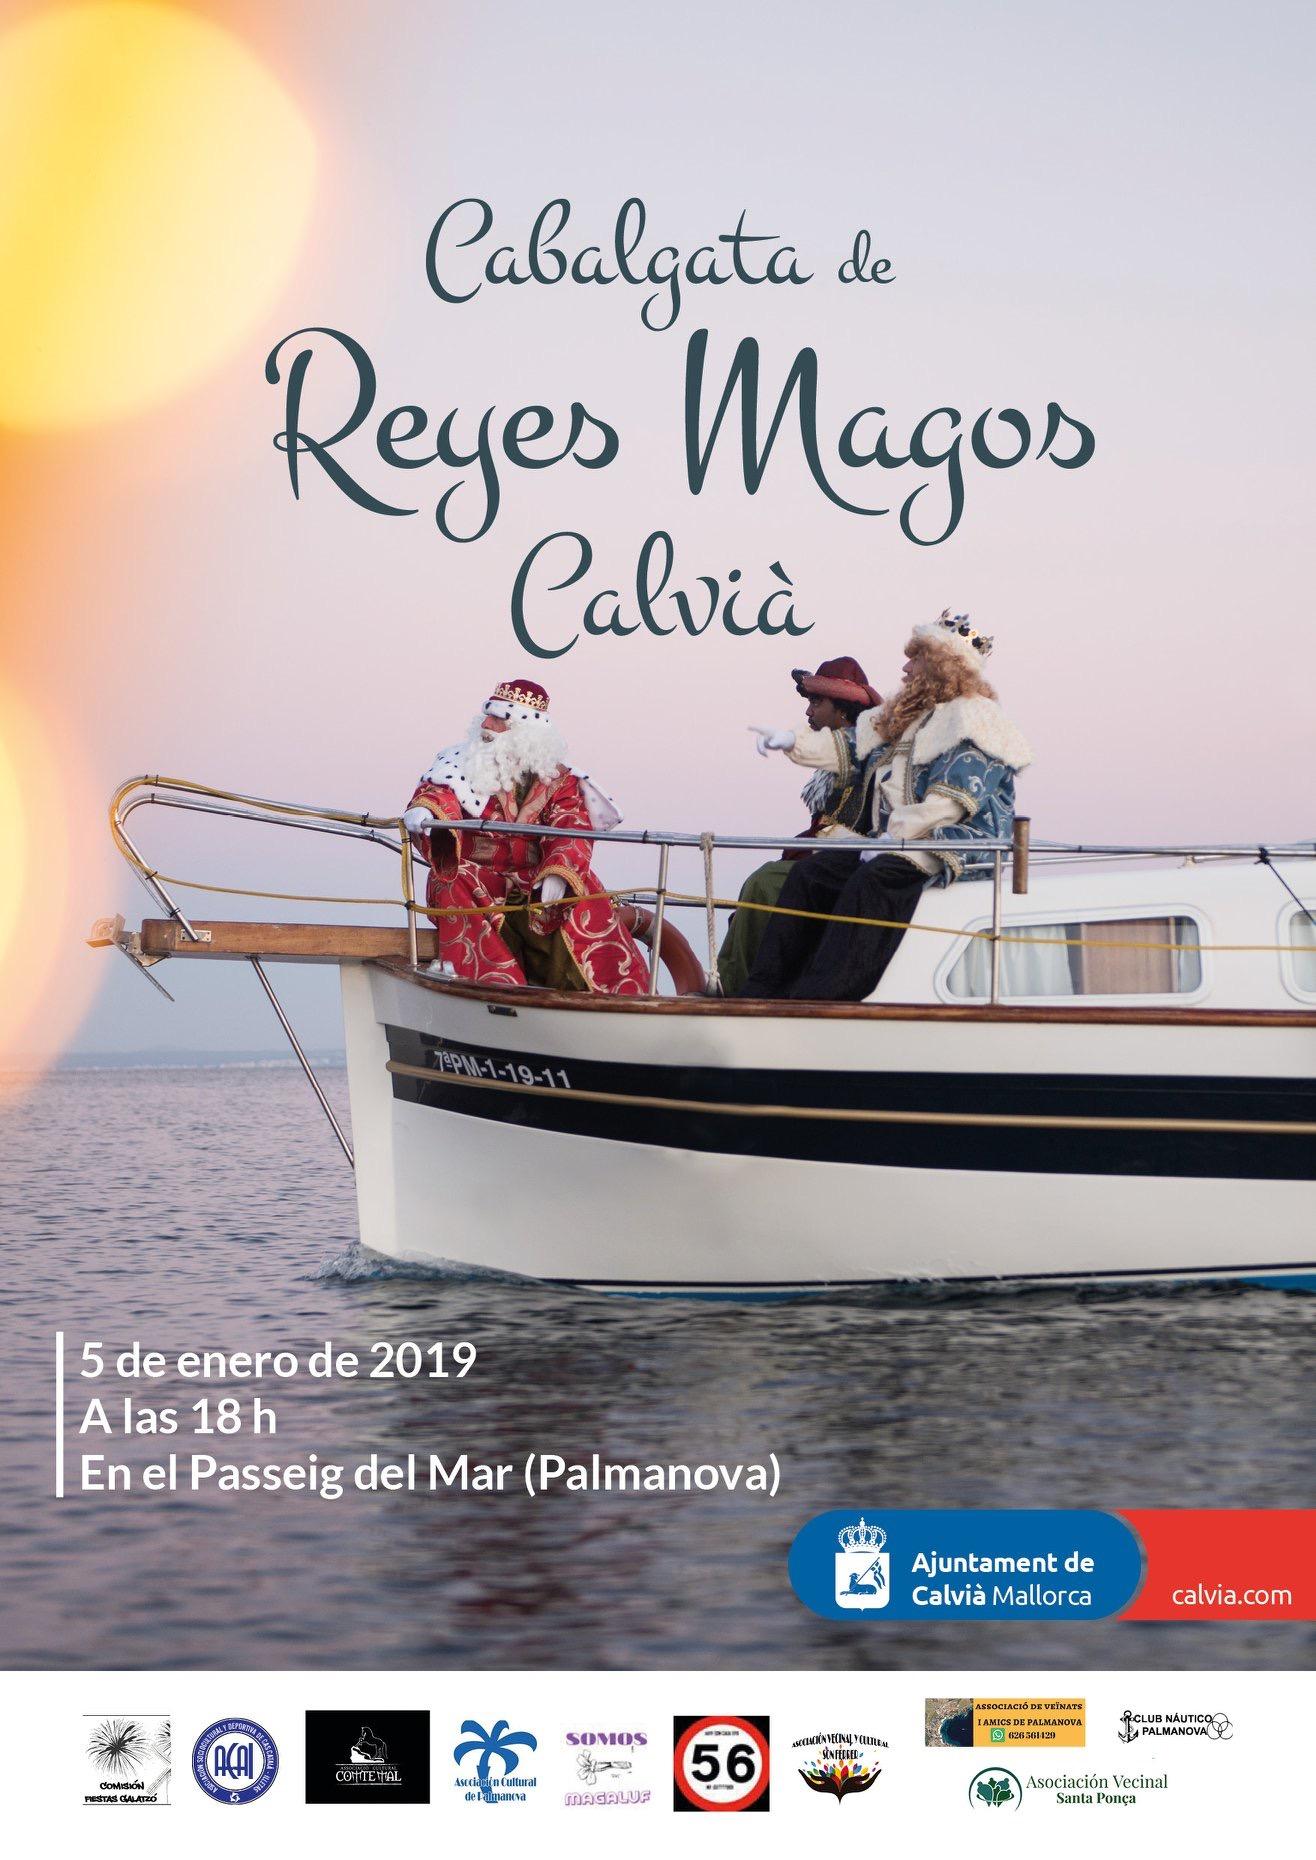 CABALGATA DE SSMM LOS REYES MAGOS EN CALVIÀ